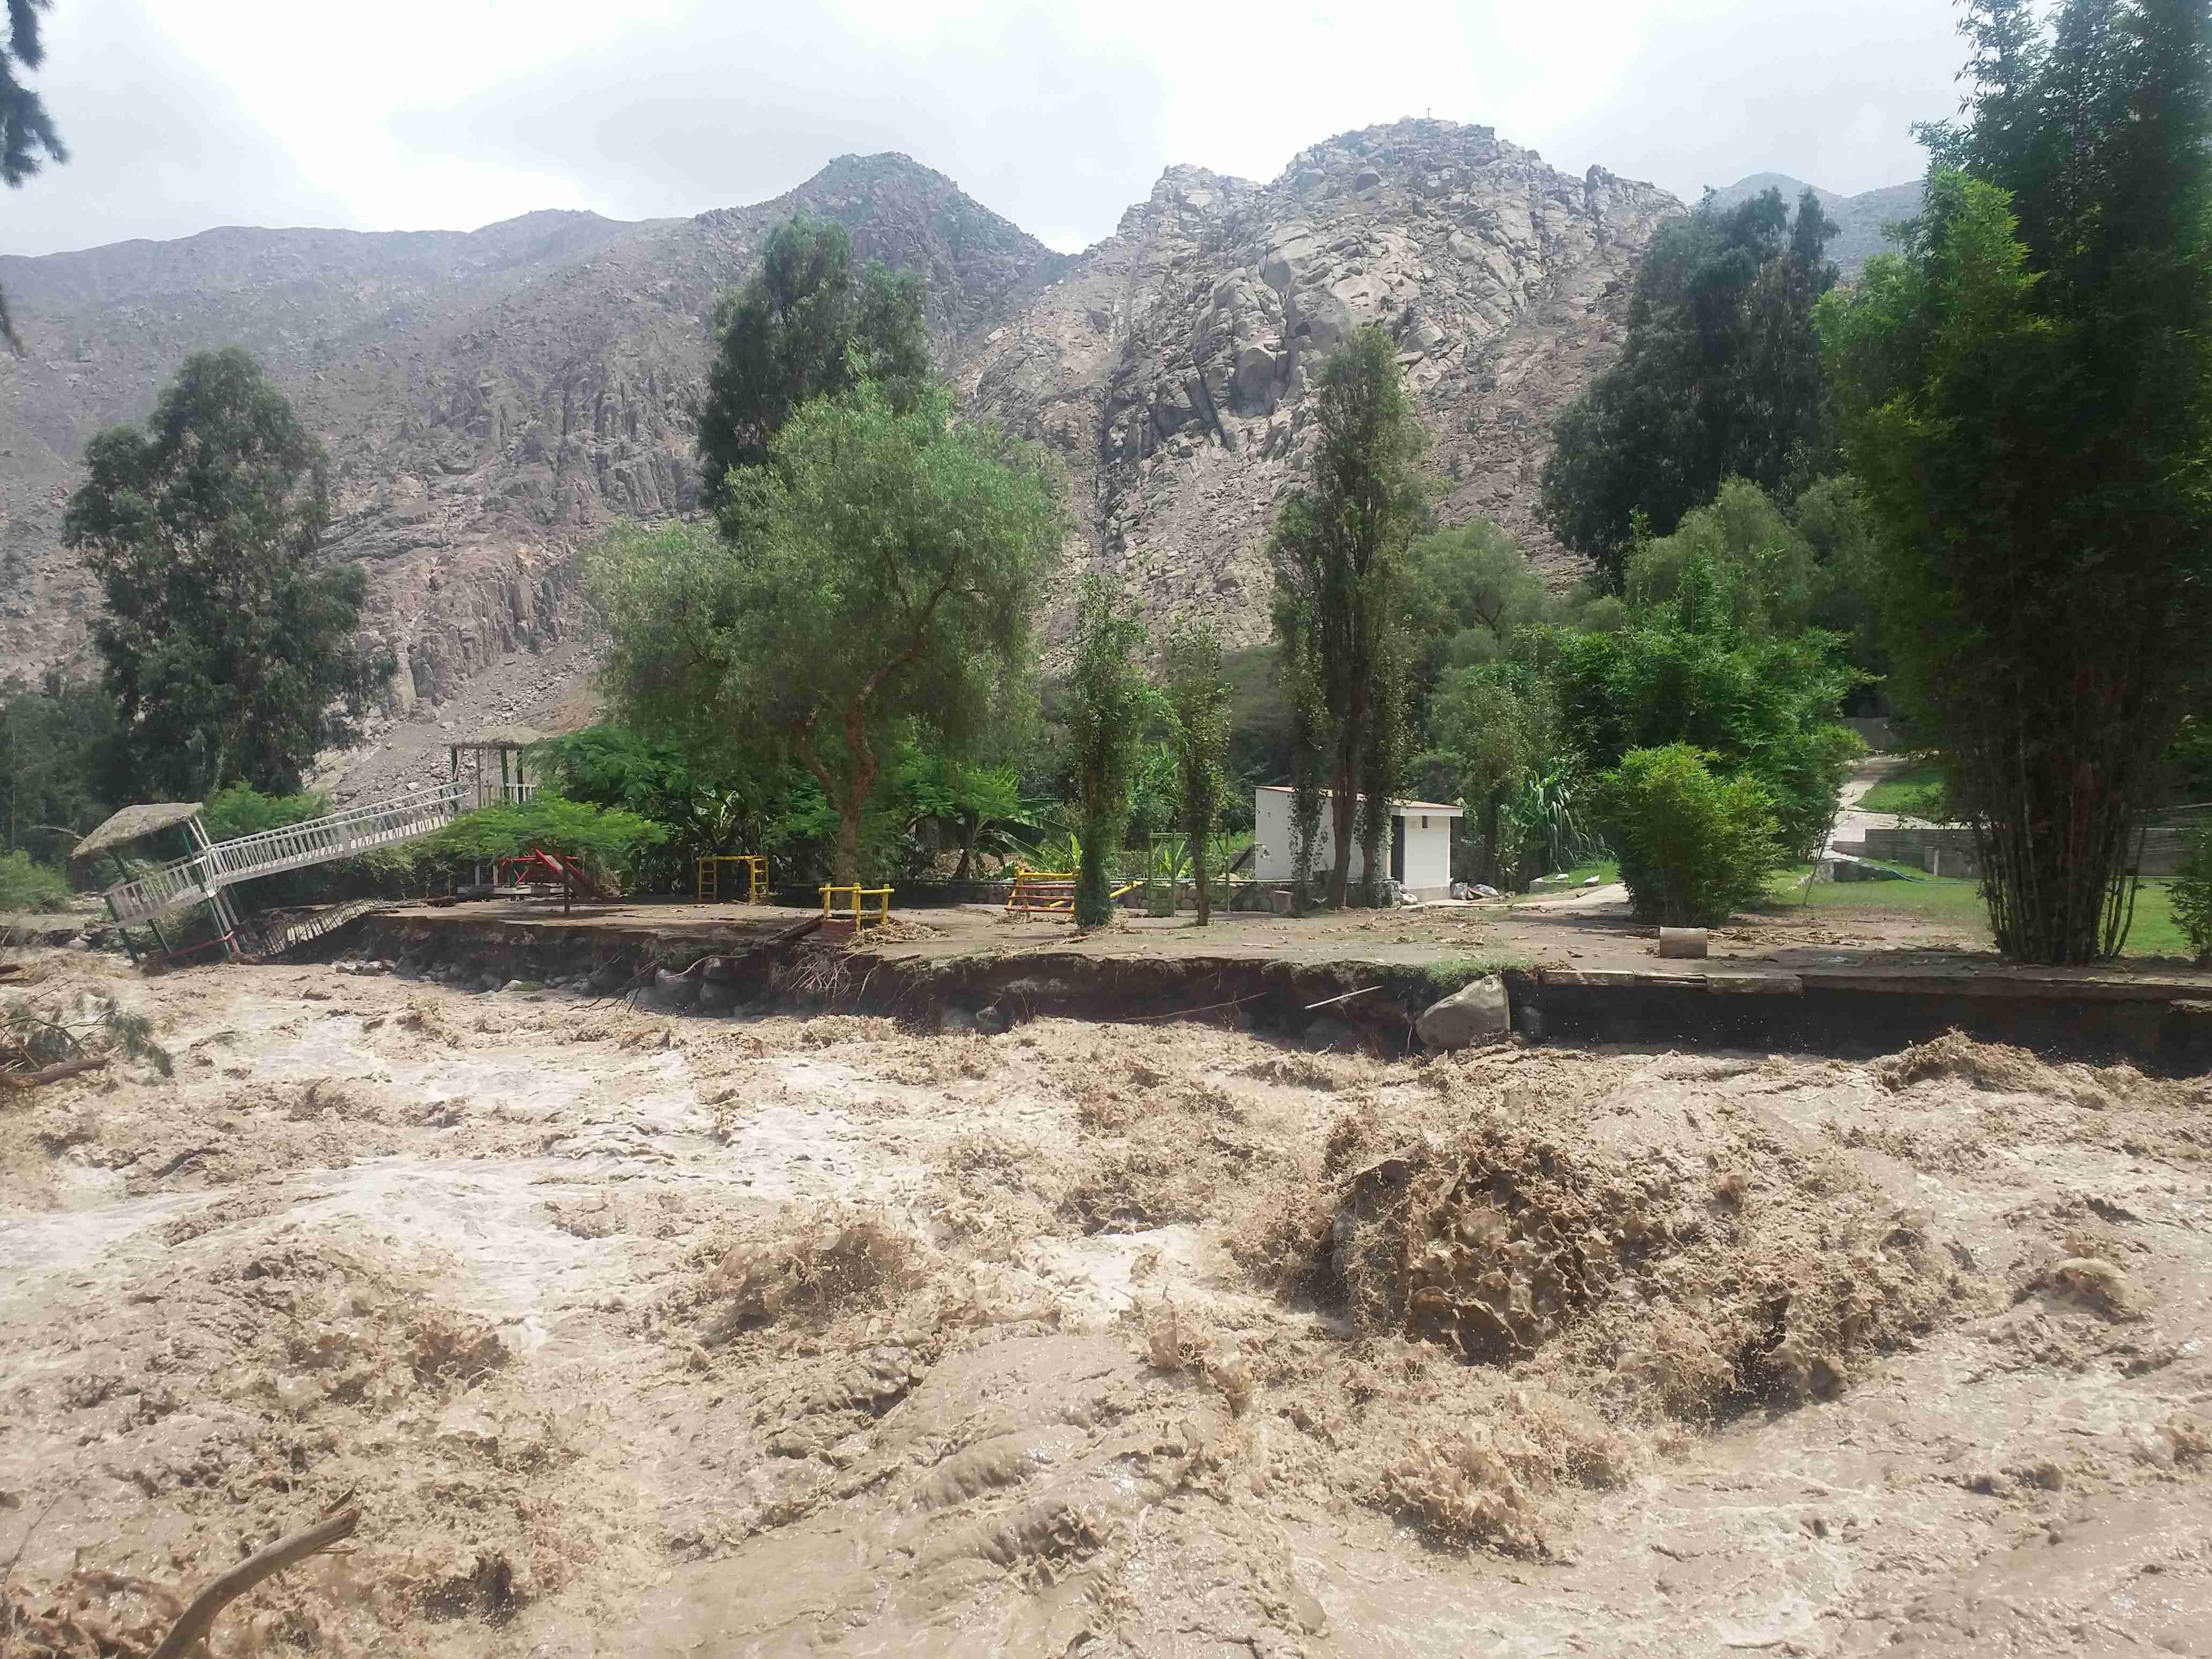 Desastres naturales en per 3 la solidaridad espa ol - Ambientadores naturales para la casa ...